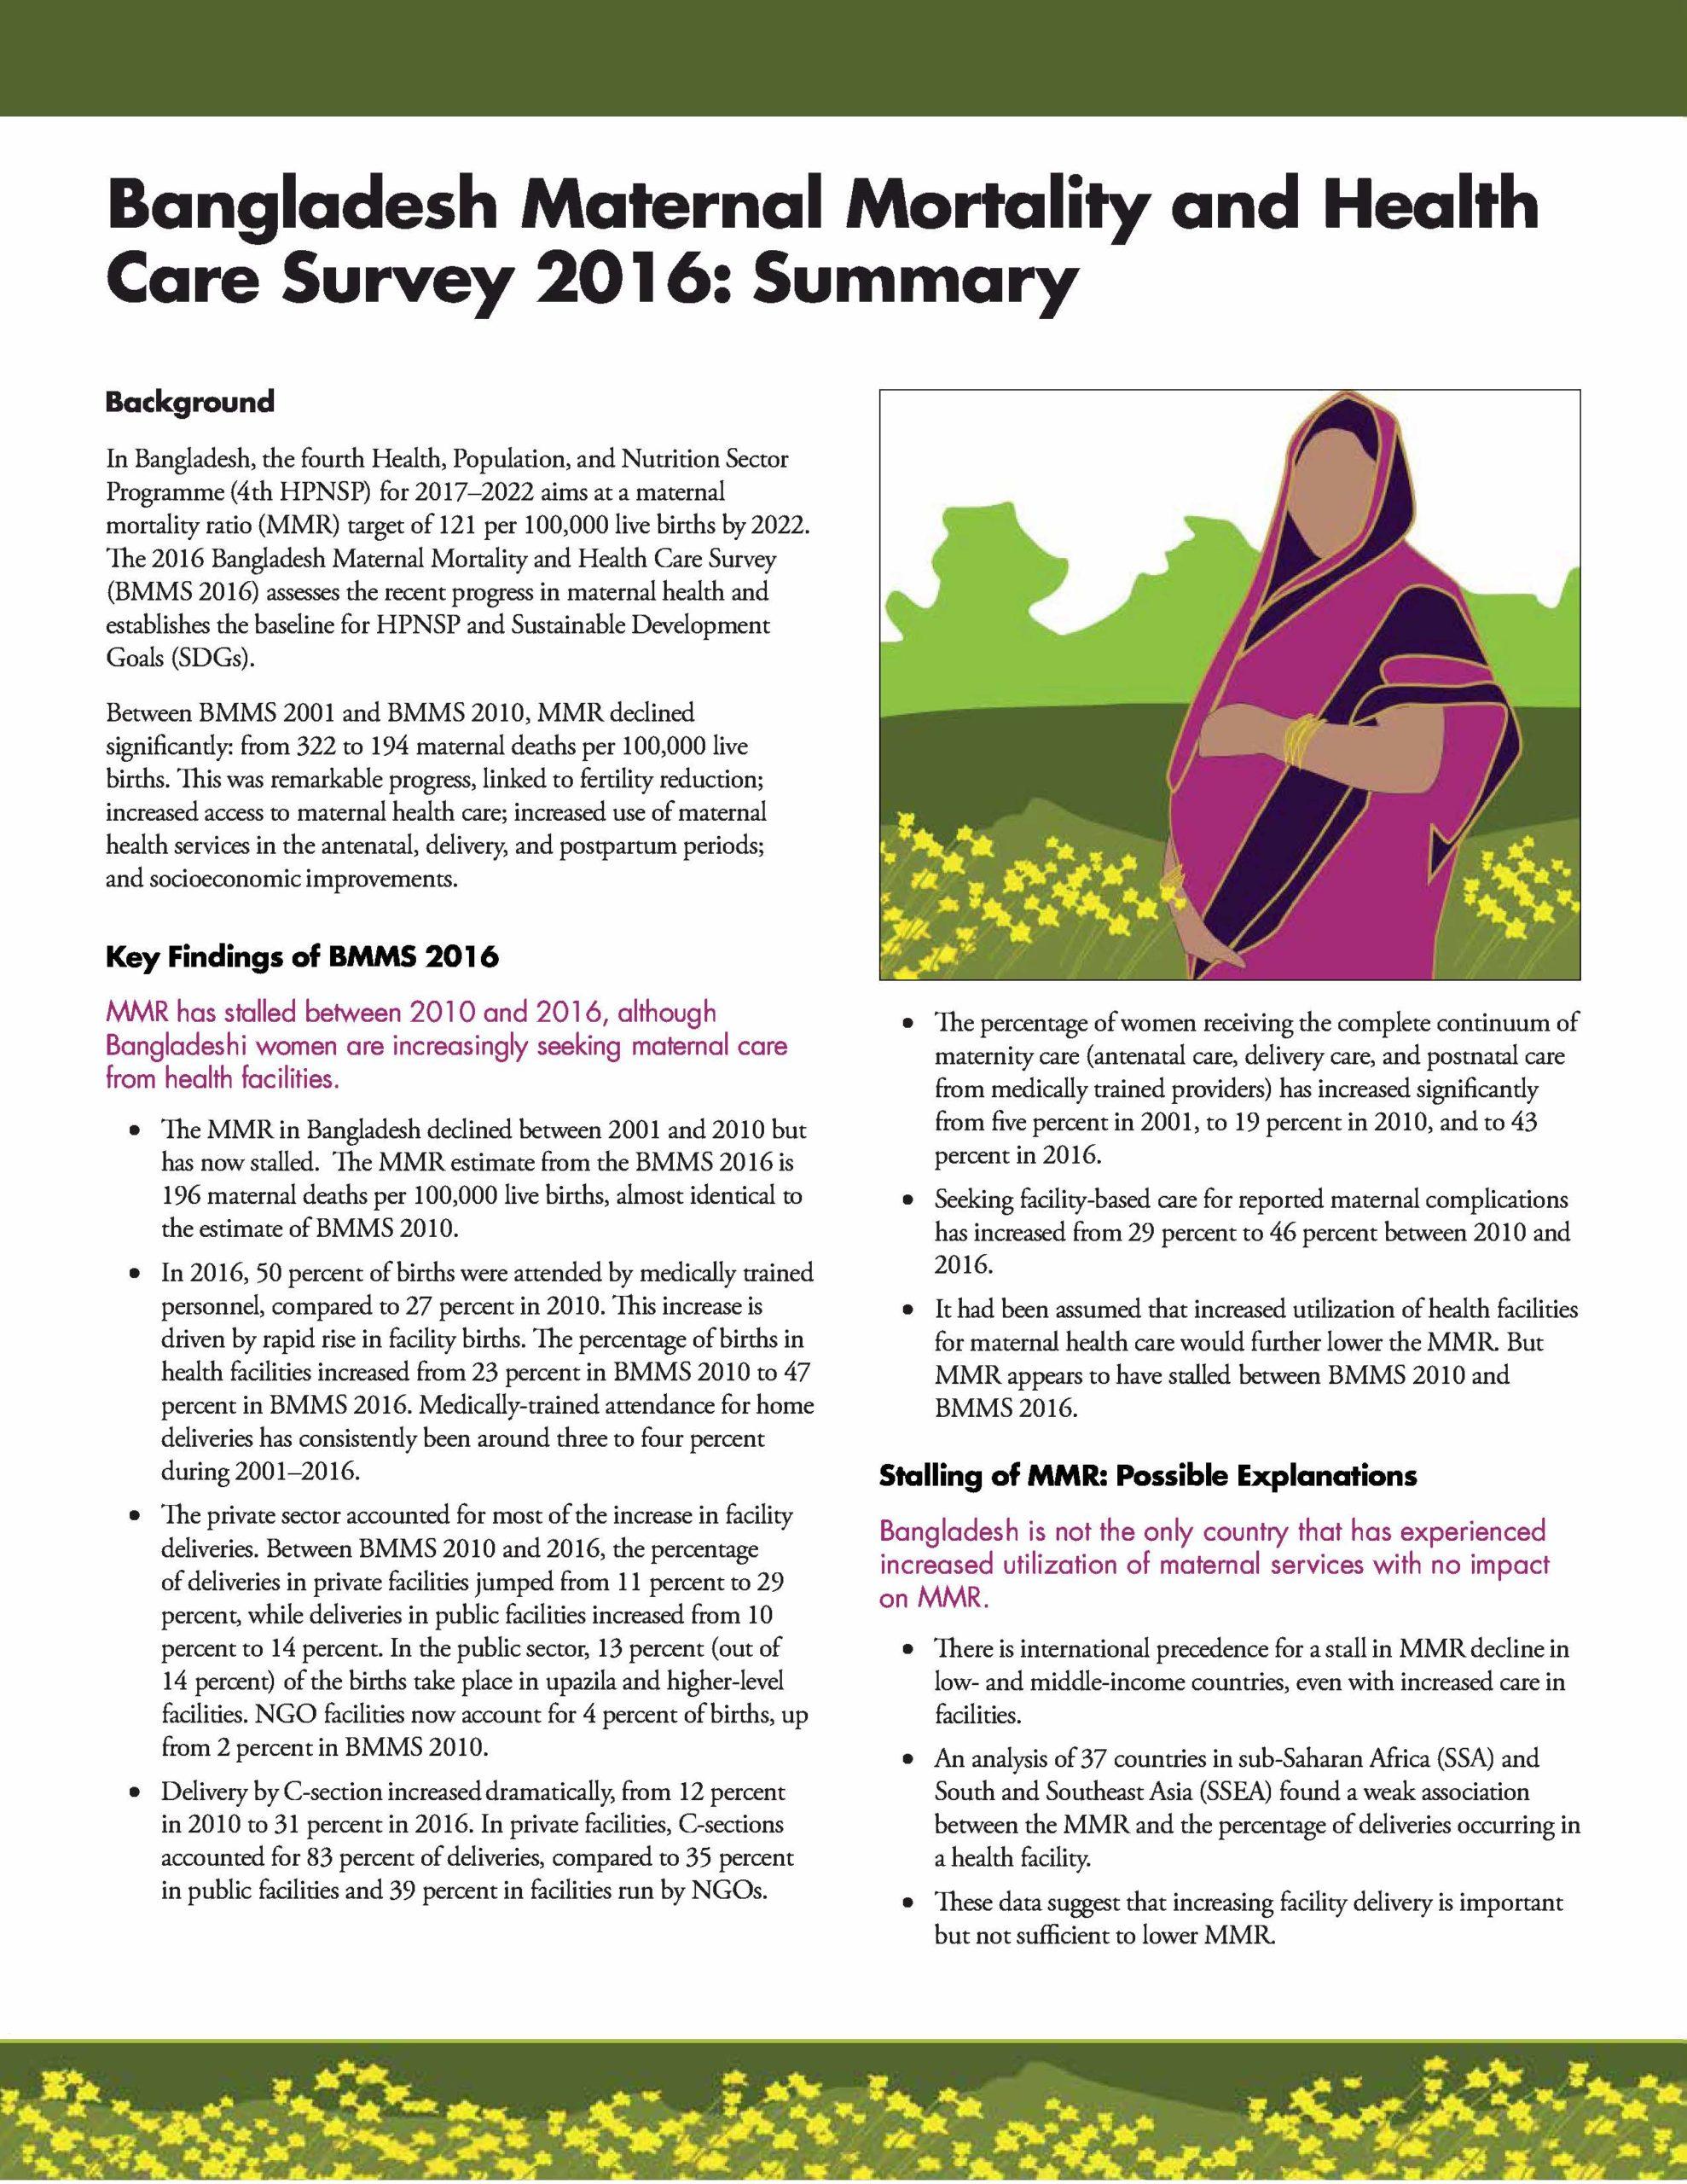 Bangladesh Maternal Mortality and Health Care Survey 2016: Summary